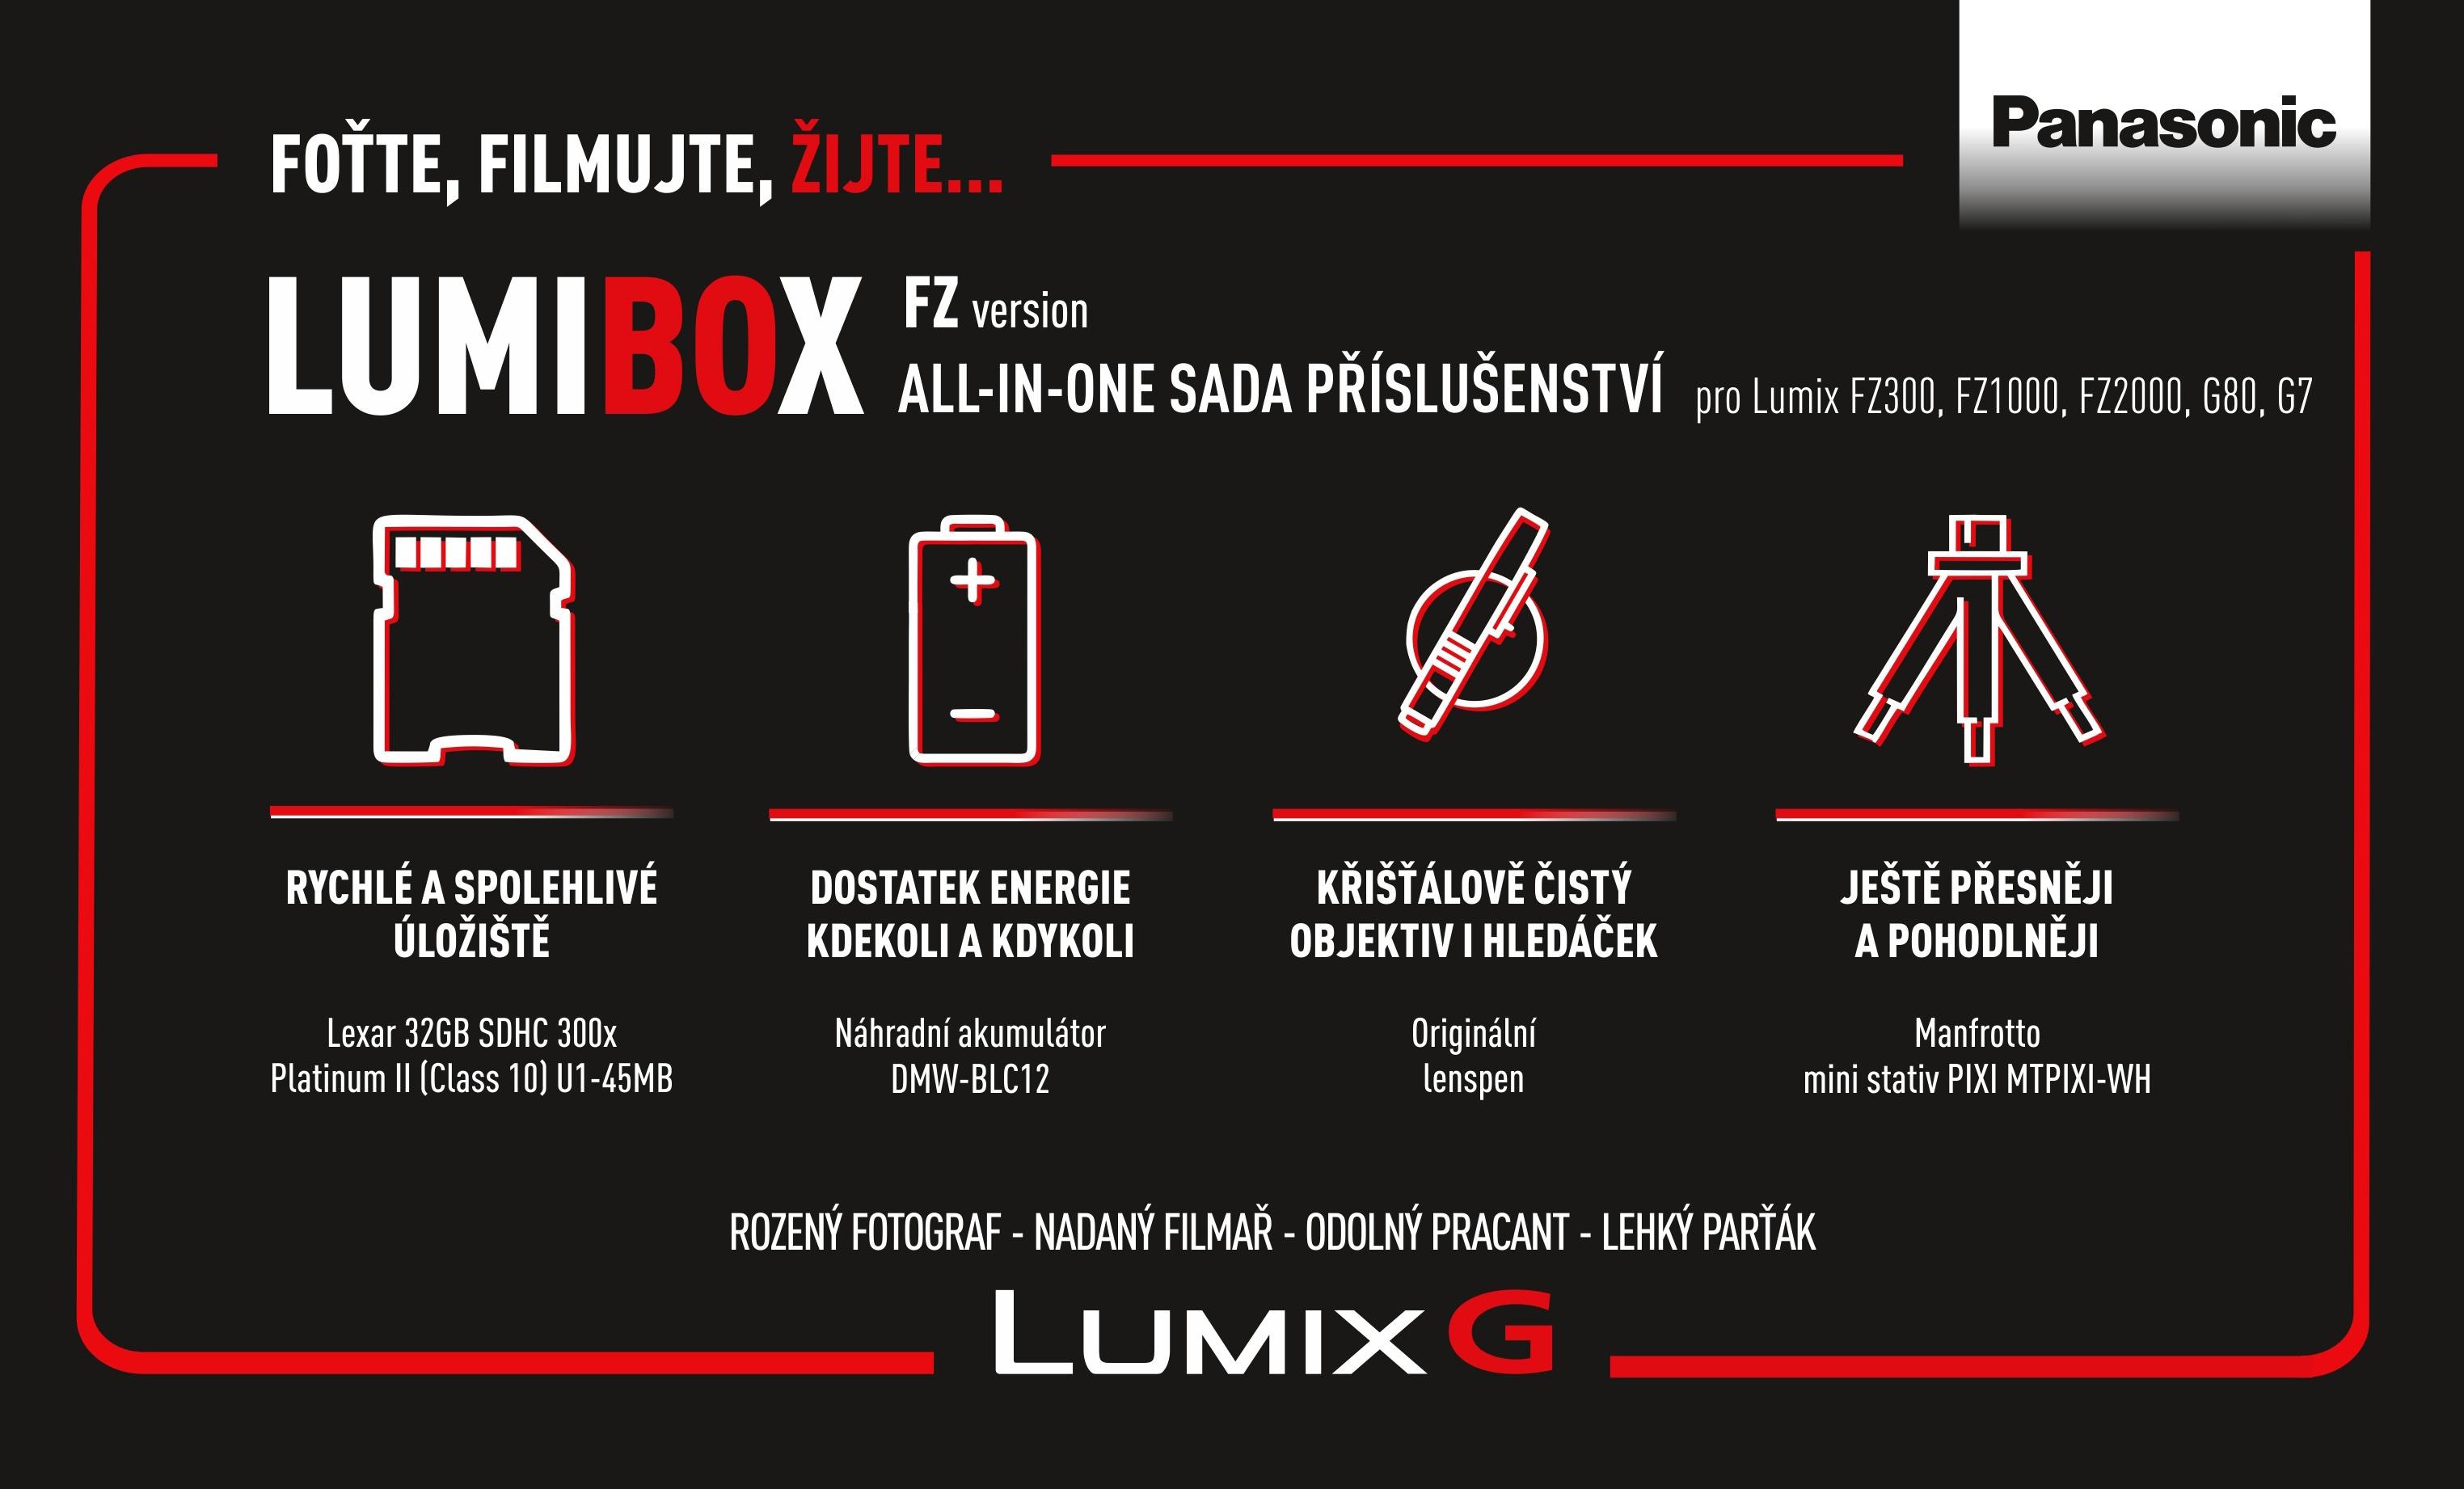 PANASONIC LumiBox sada příslušenství pro FZ